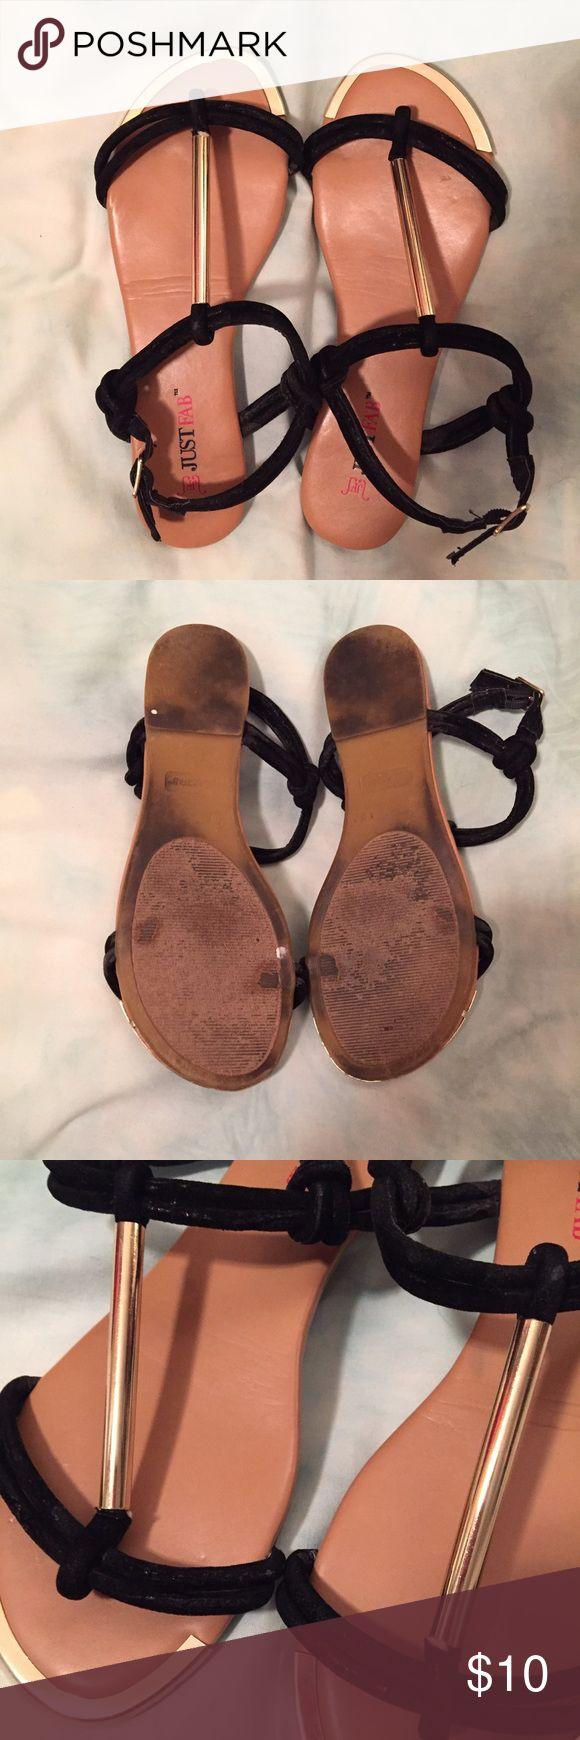 Black sandals gold bar - Black Sandals Gold Bar 42